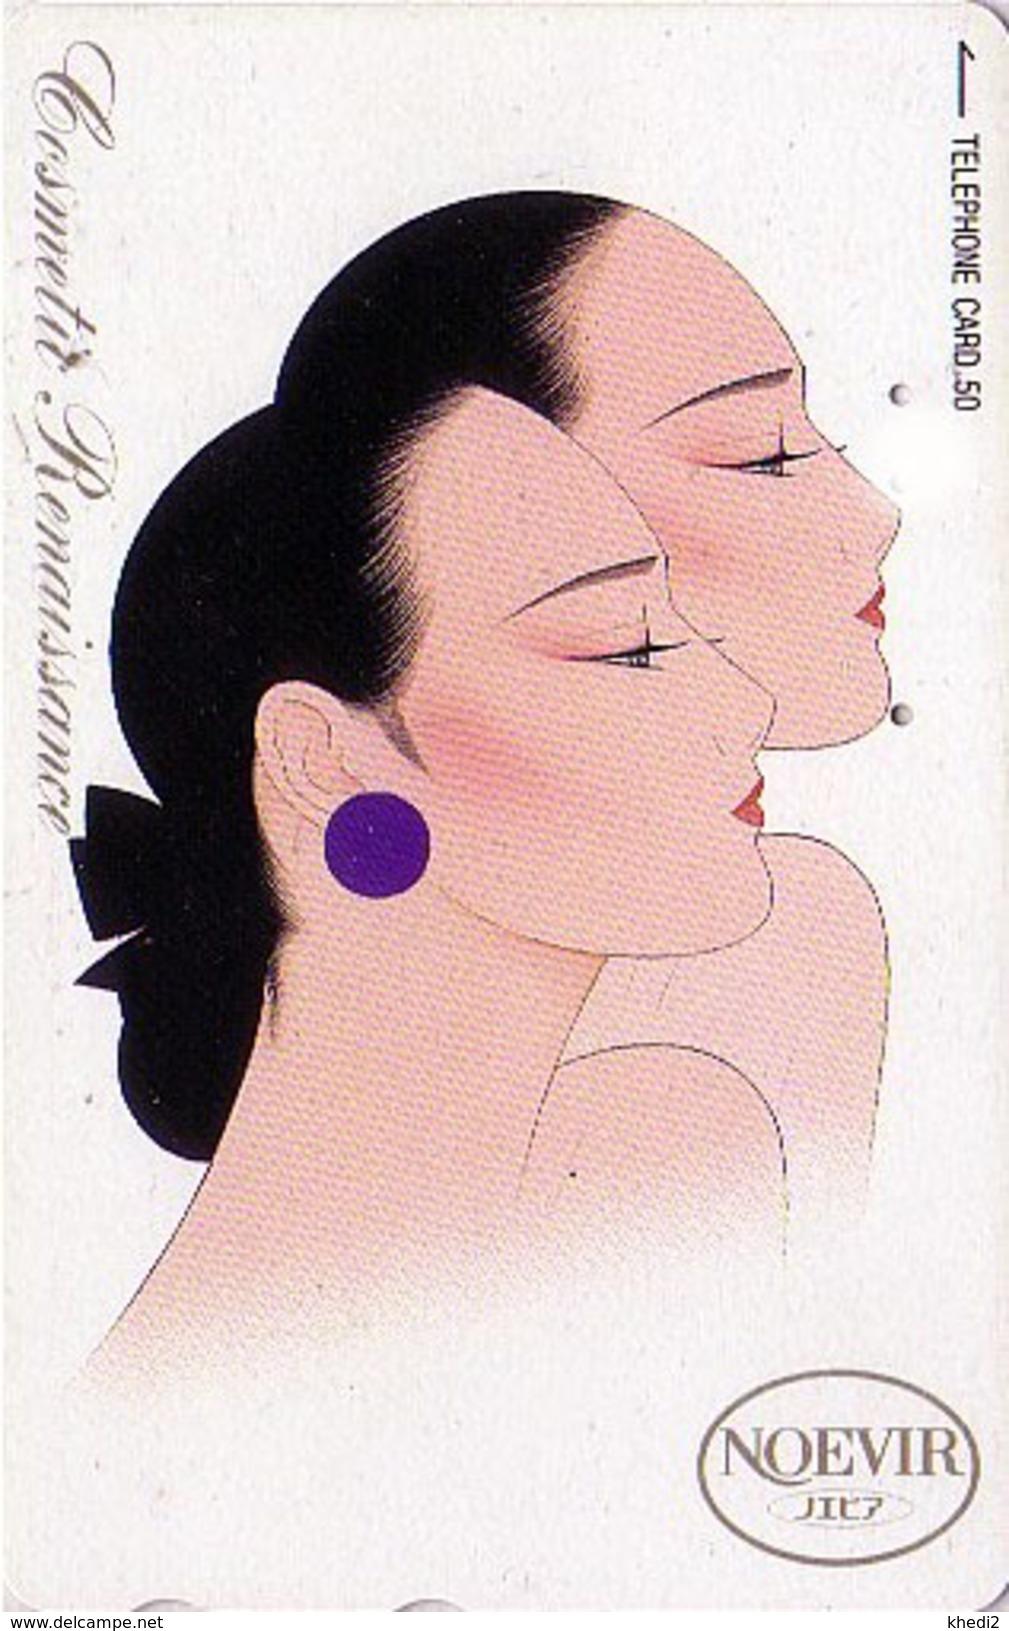 Télécarte Japon / 110-125265 - Cosmétiques NOEVIR / Femme - Girl Japan Cosmetics Phonecard Parfum Perfume - 228 - Parfum